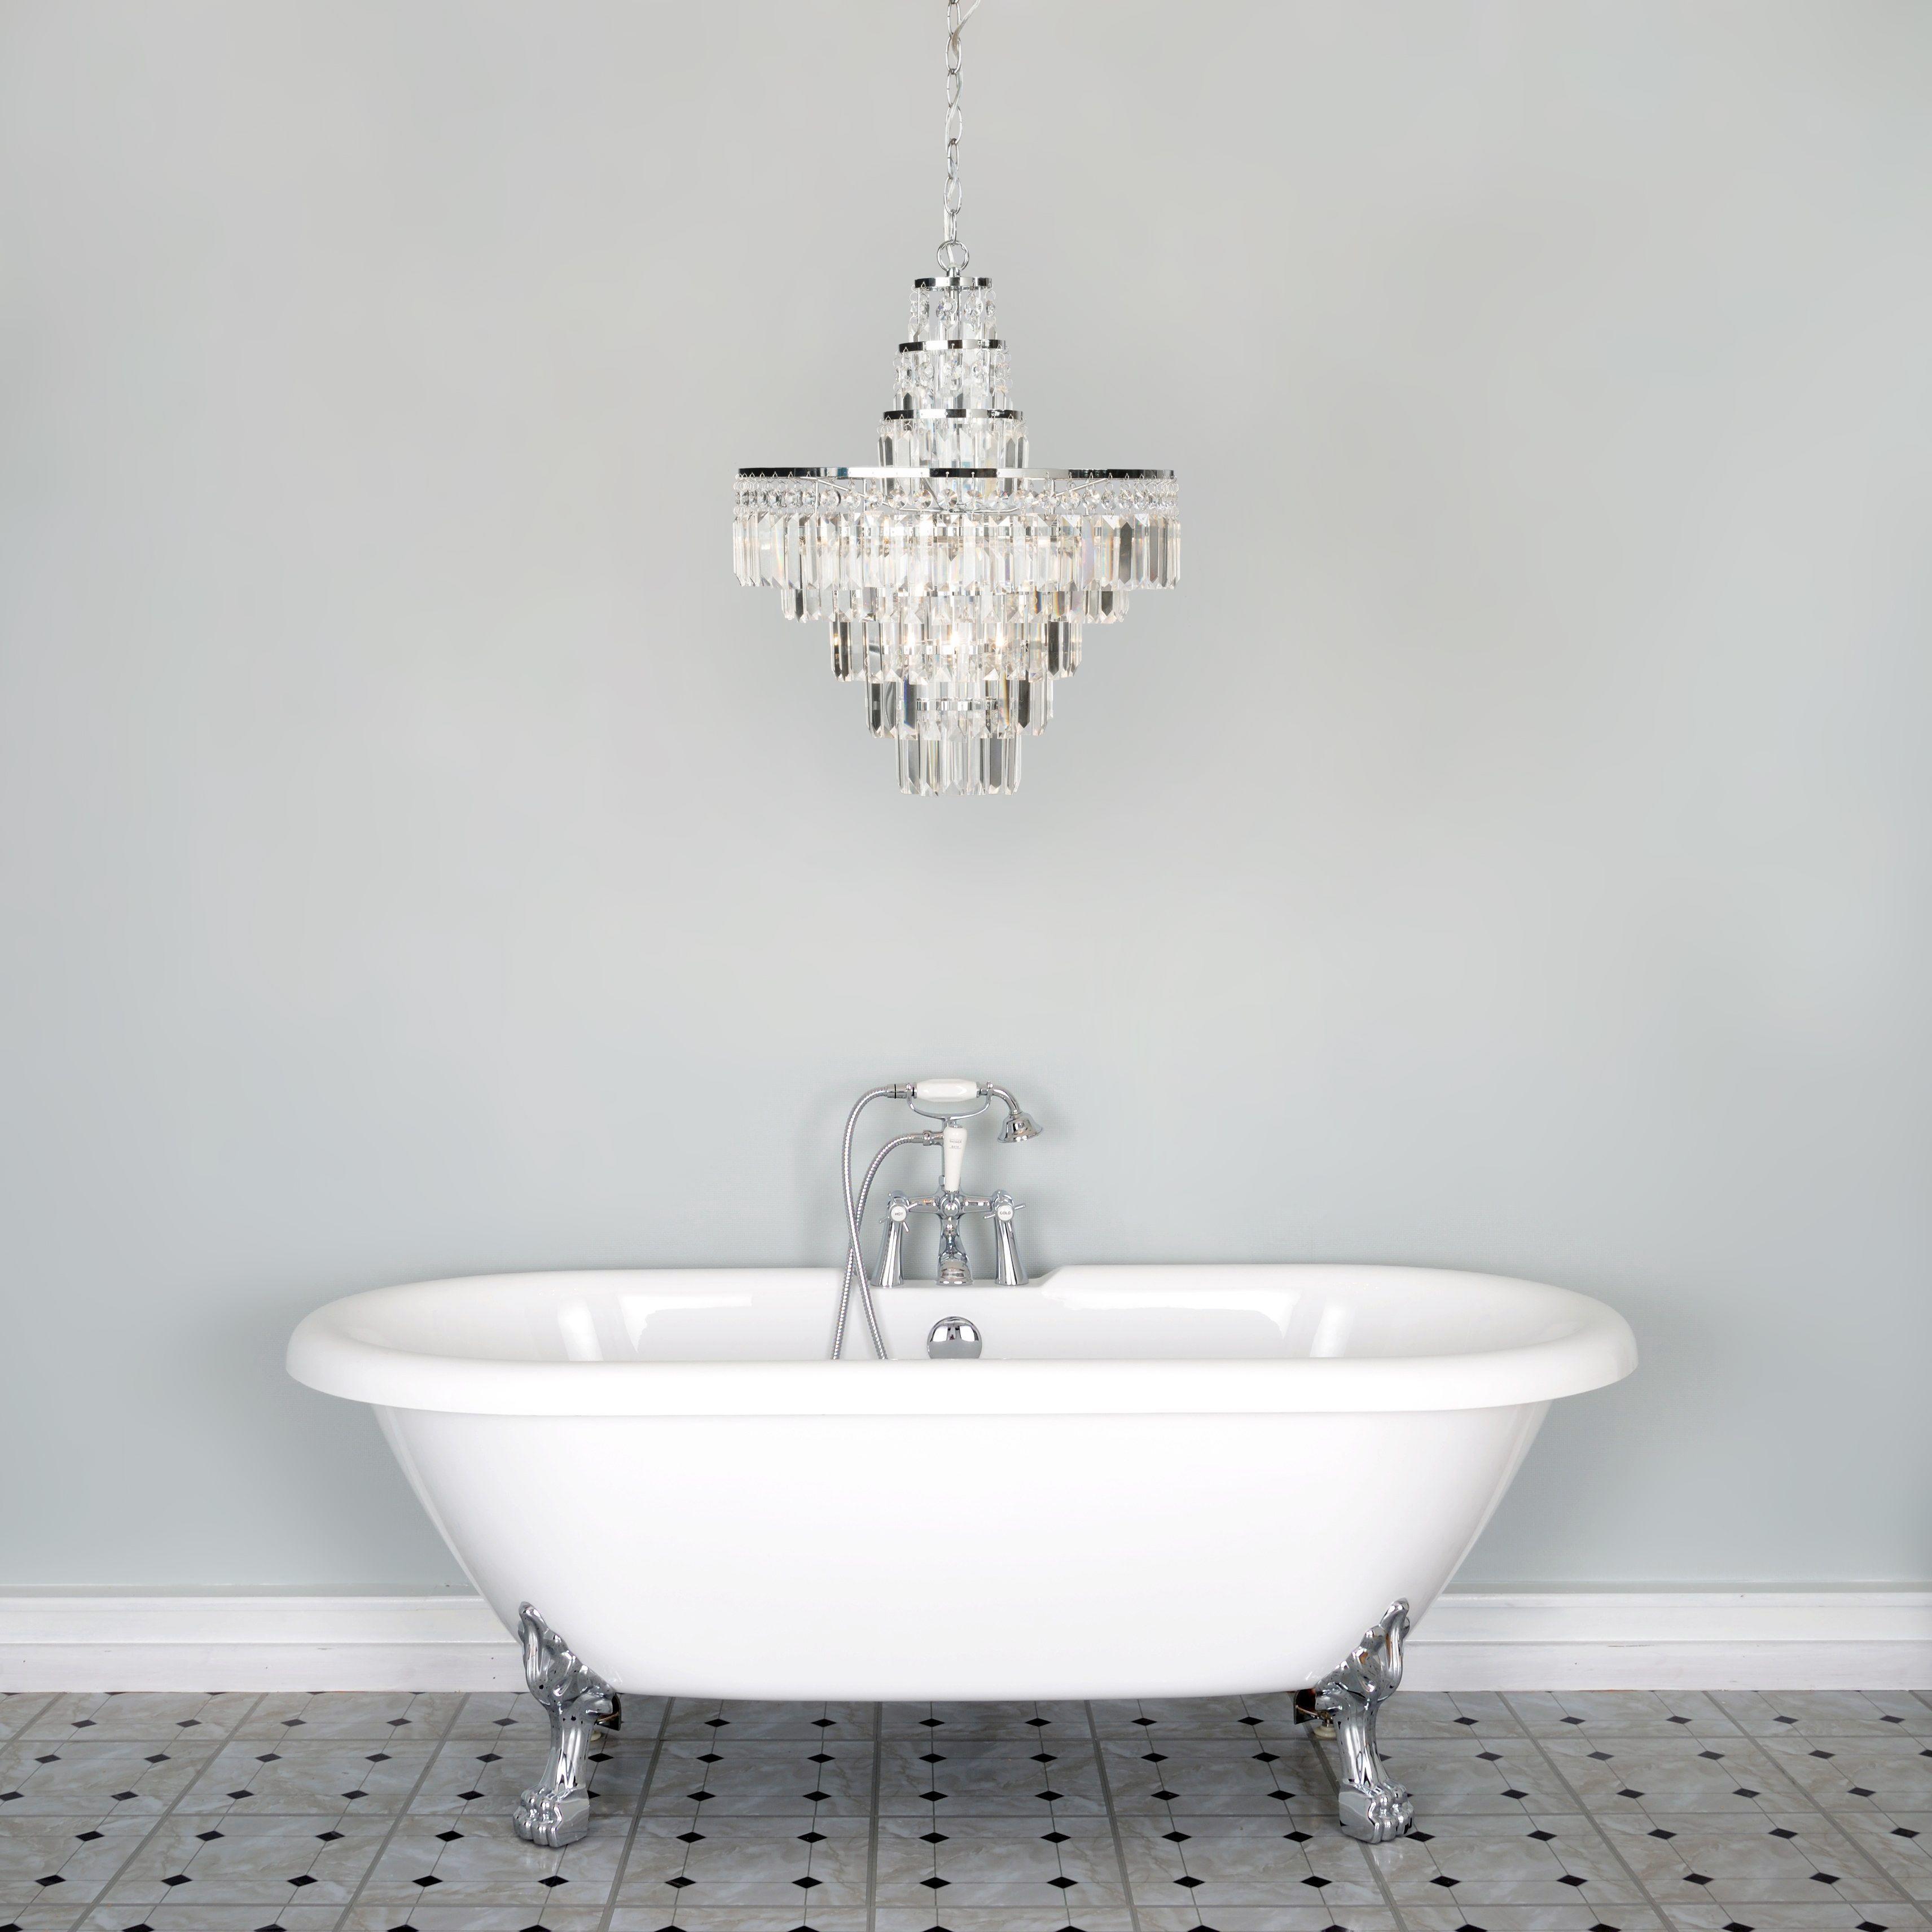 New Vasca Bathroom Lighting Range Litecraft